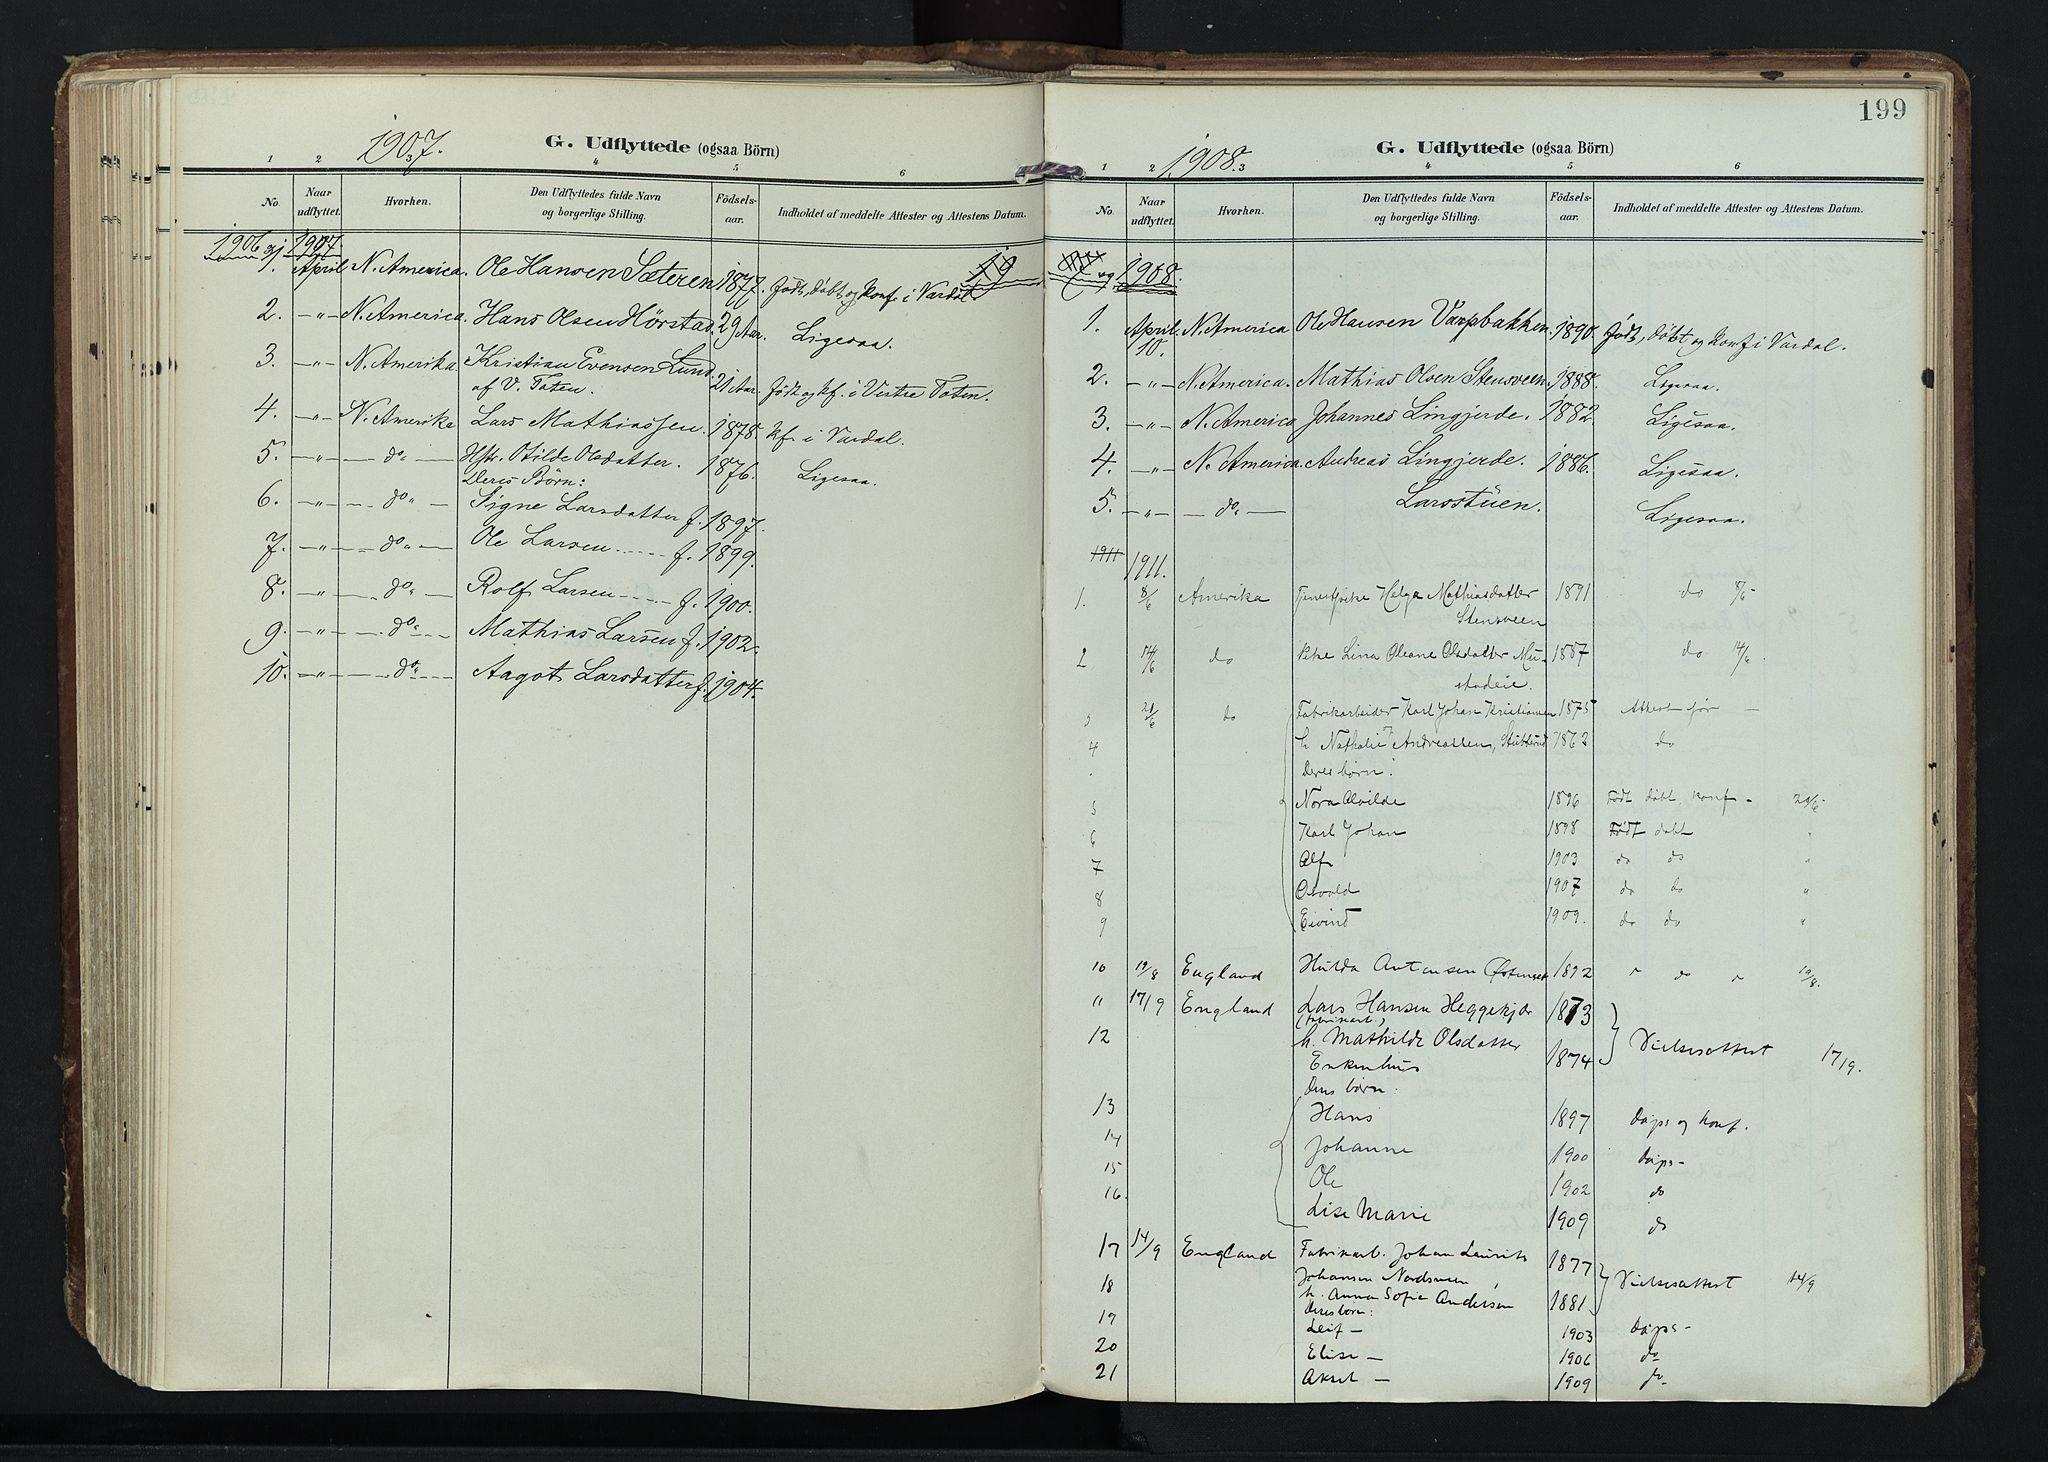 SAH, Vardal prestekontor, H/Ha/Haa/L0020: Ministerialbok nr. 20, 1907-1921, s. 199